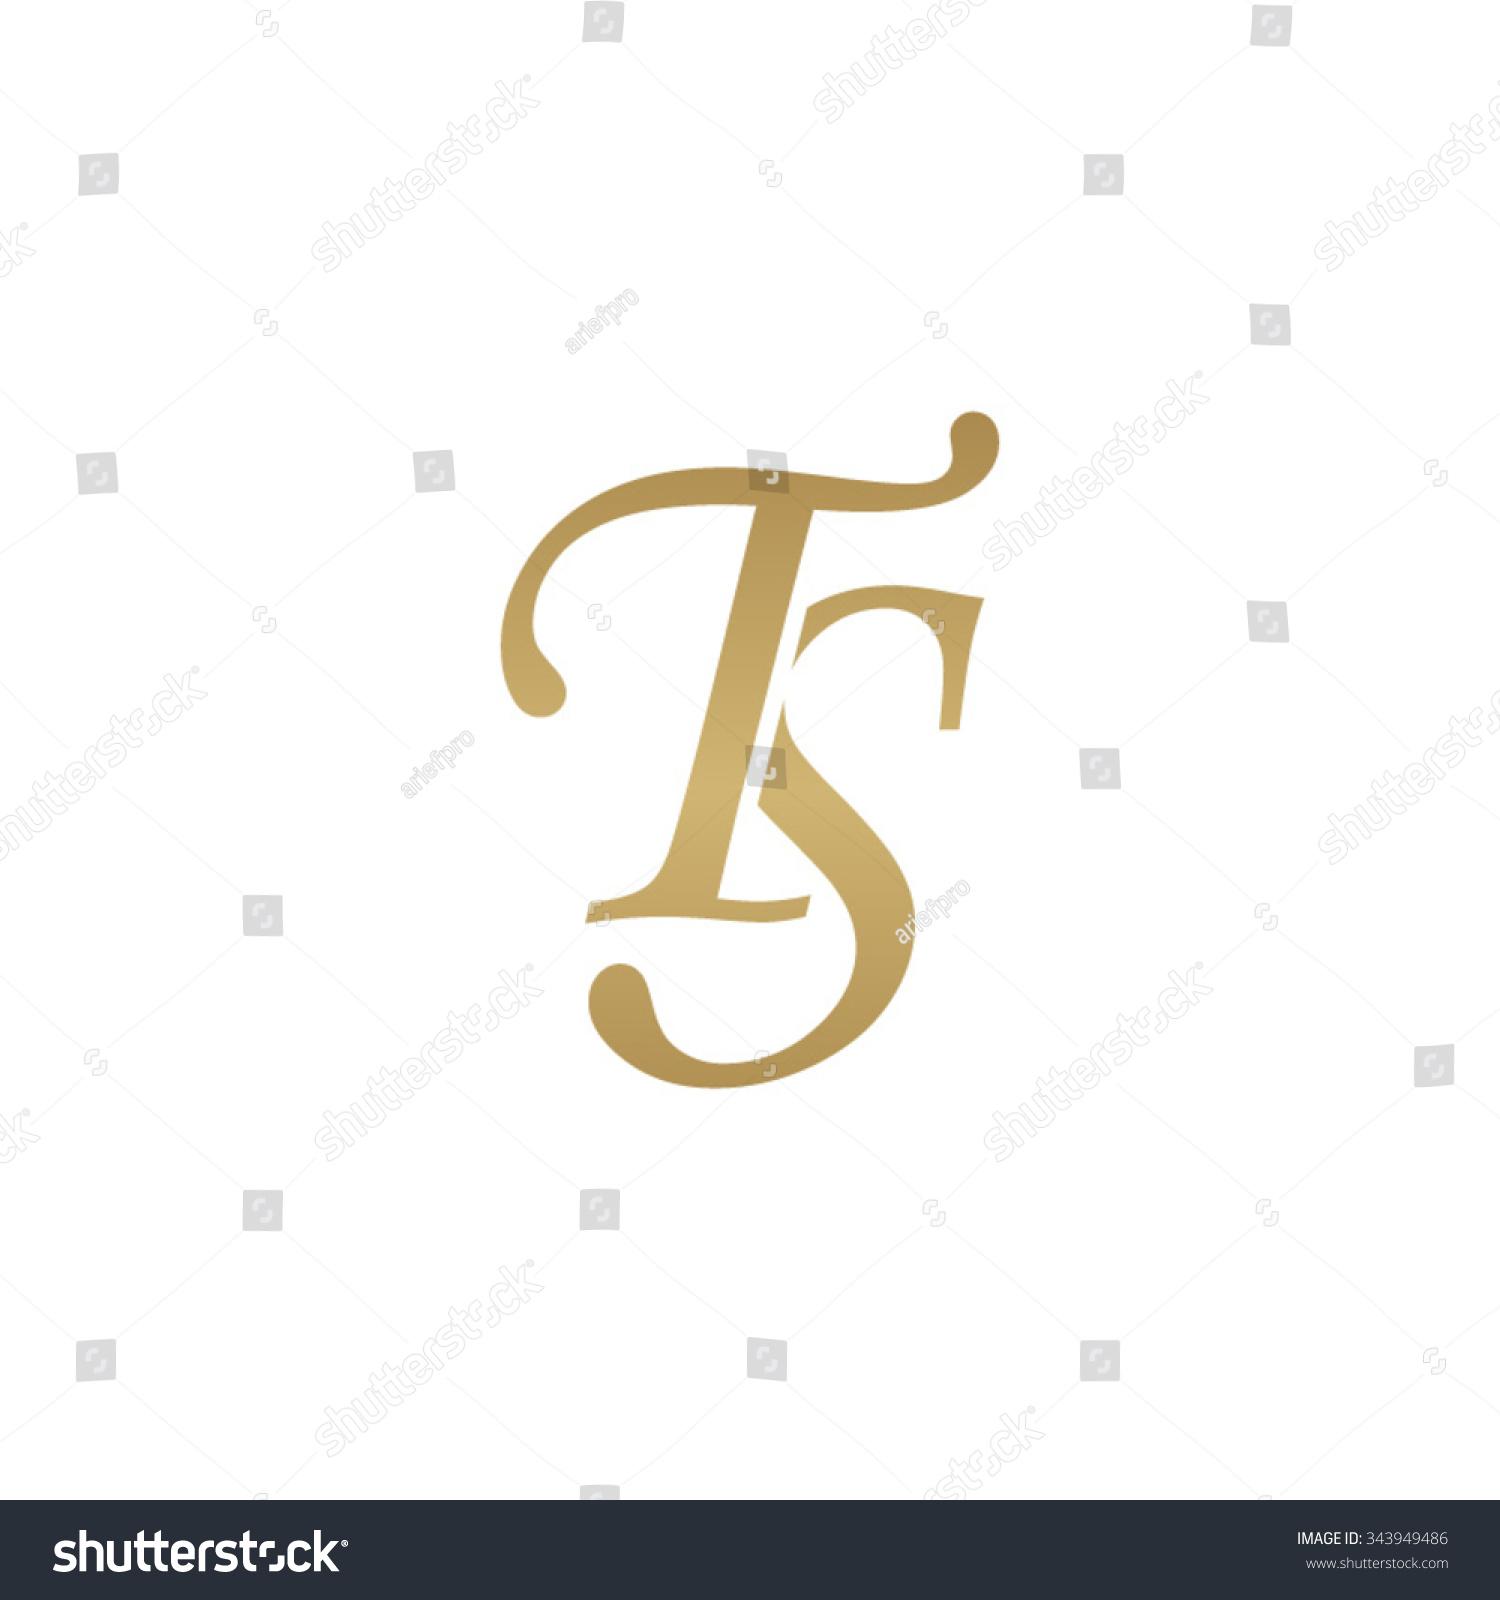 Tj initial luxury ornament monogram logo stock vector - Ts Initial Monogram Logo Illustration Vectorielle Libre De Droits 343949486 Shutterstock